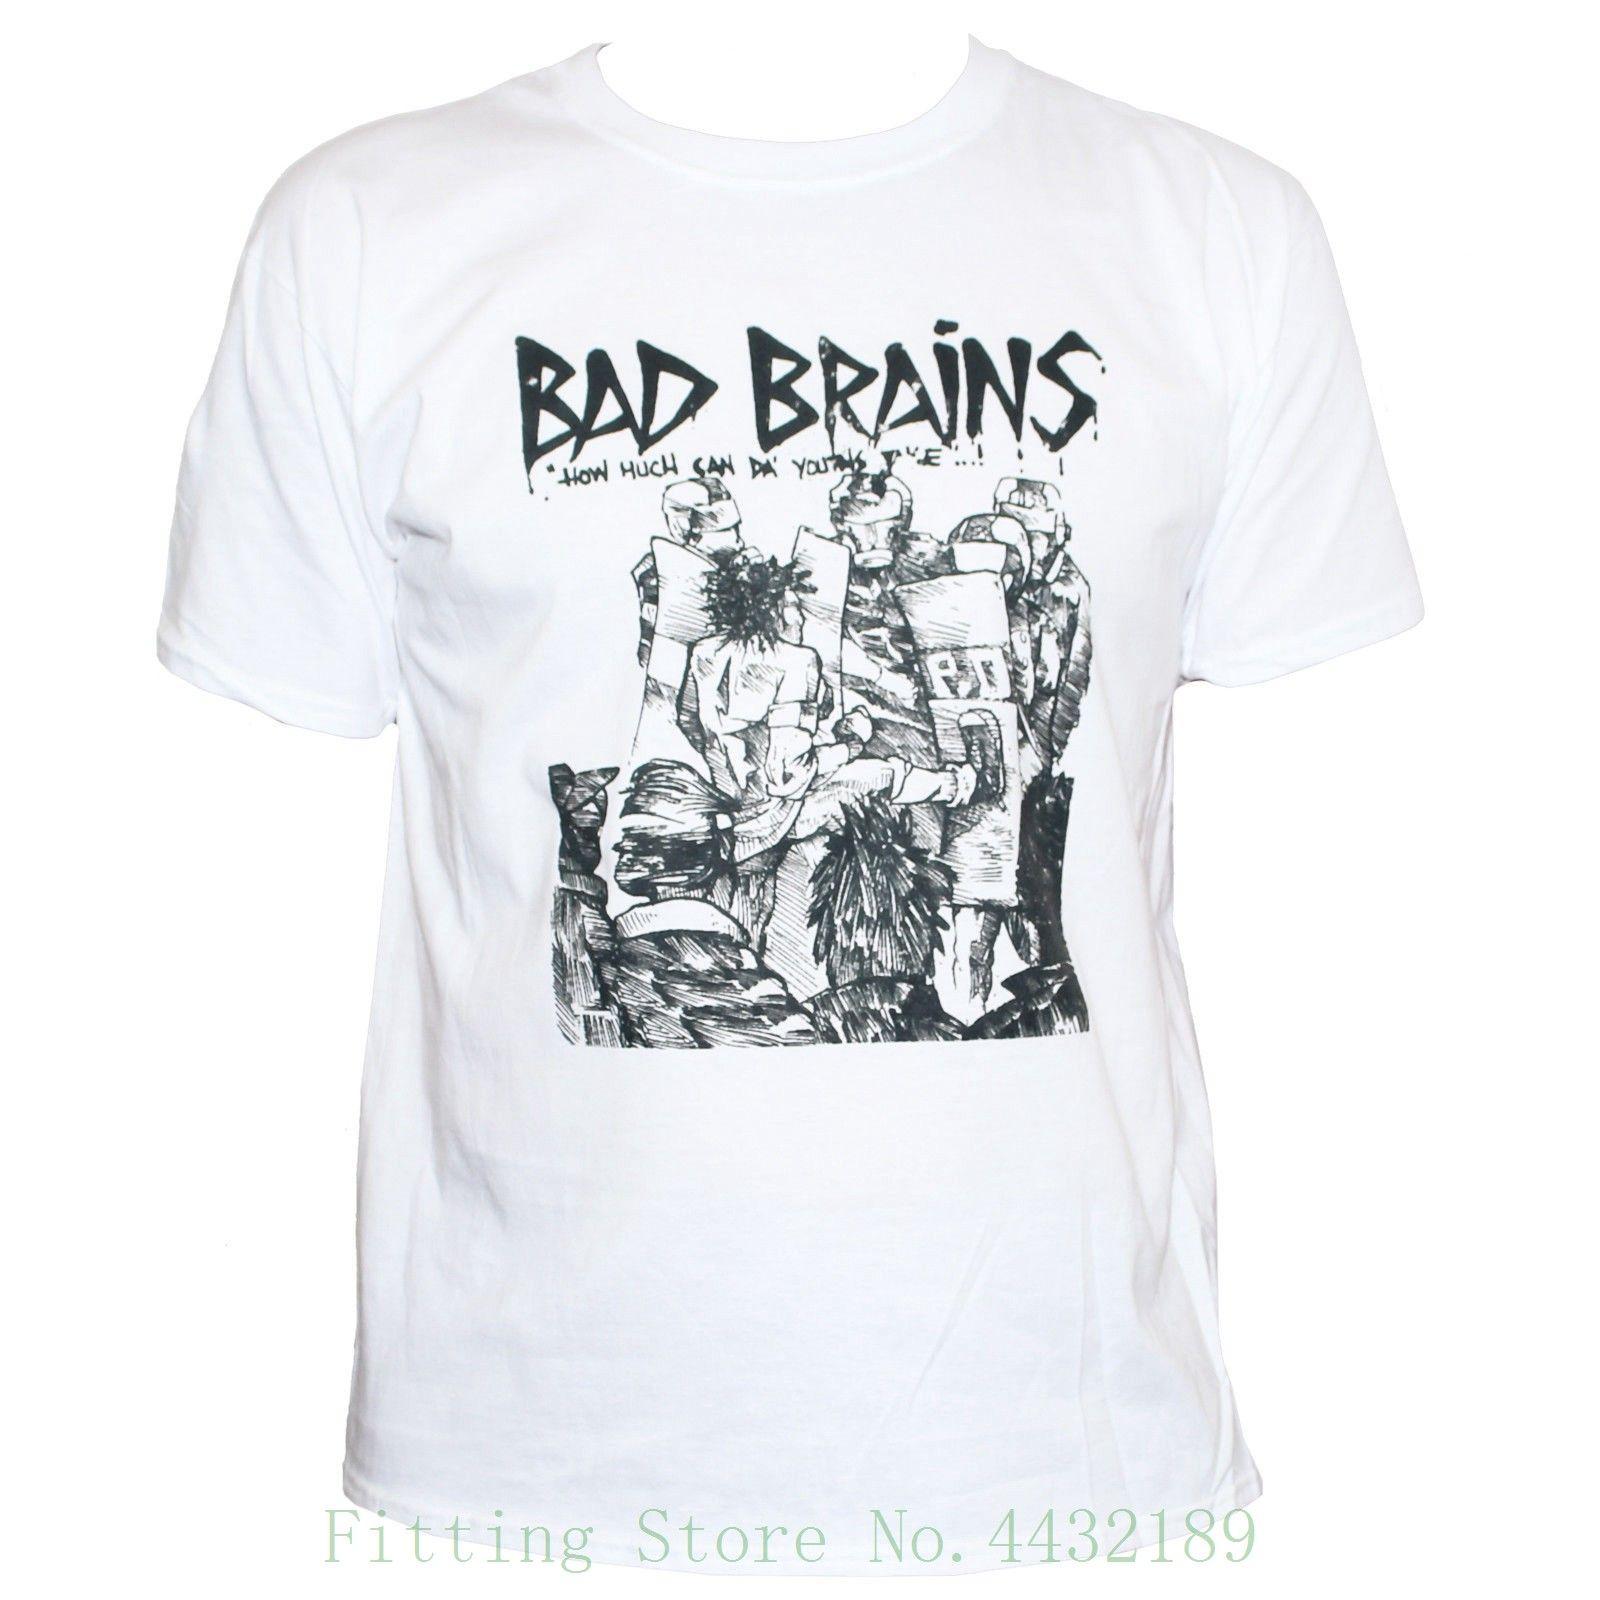 Bad Brains T Shirt Punk Rock Minor Threat Fugazi Graphic Band Tee Unisex  2018 Summer T Shirt